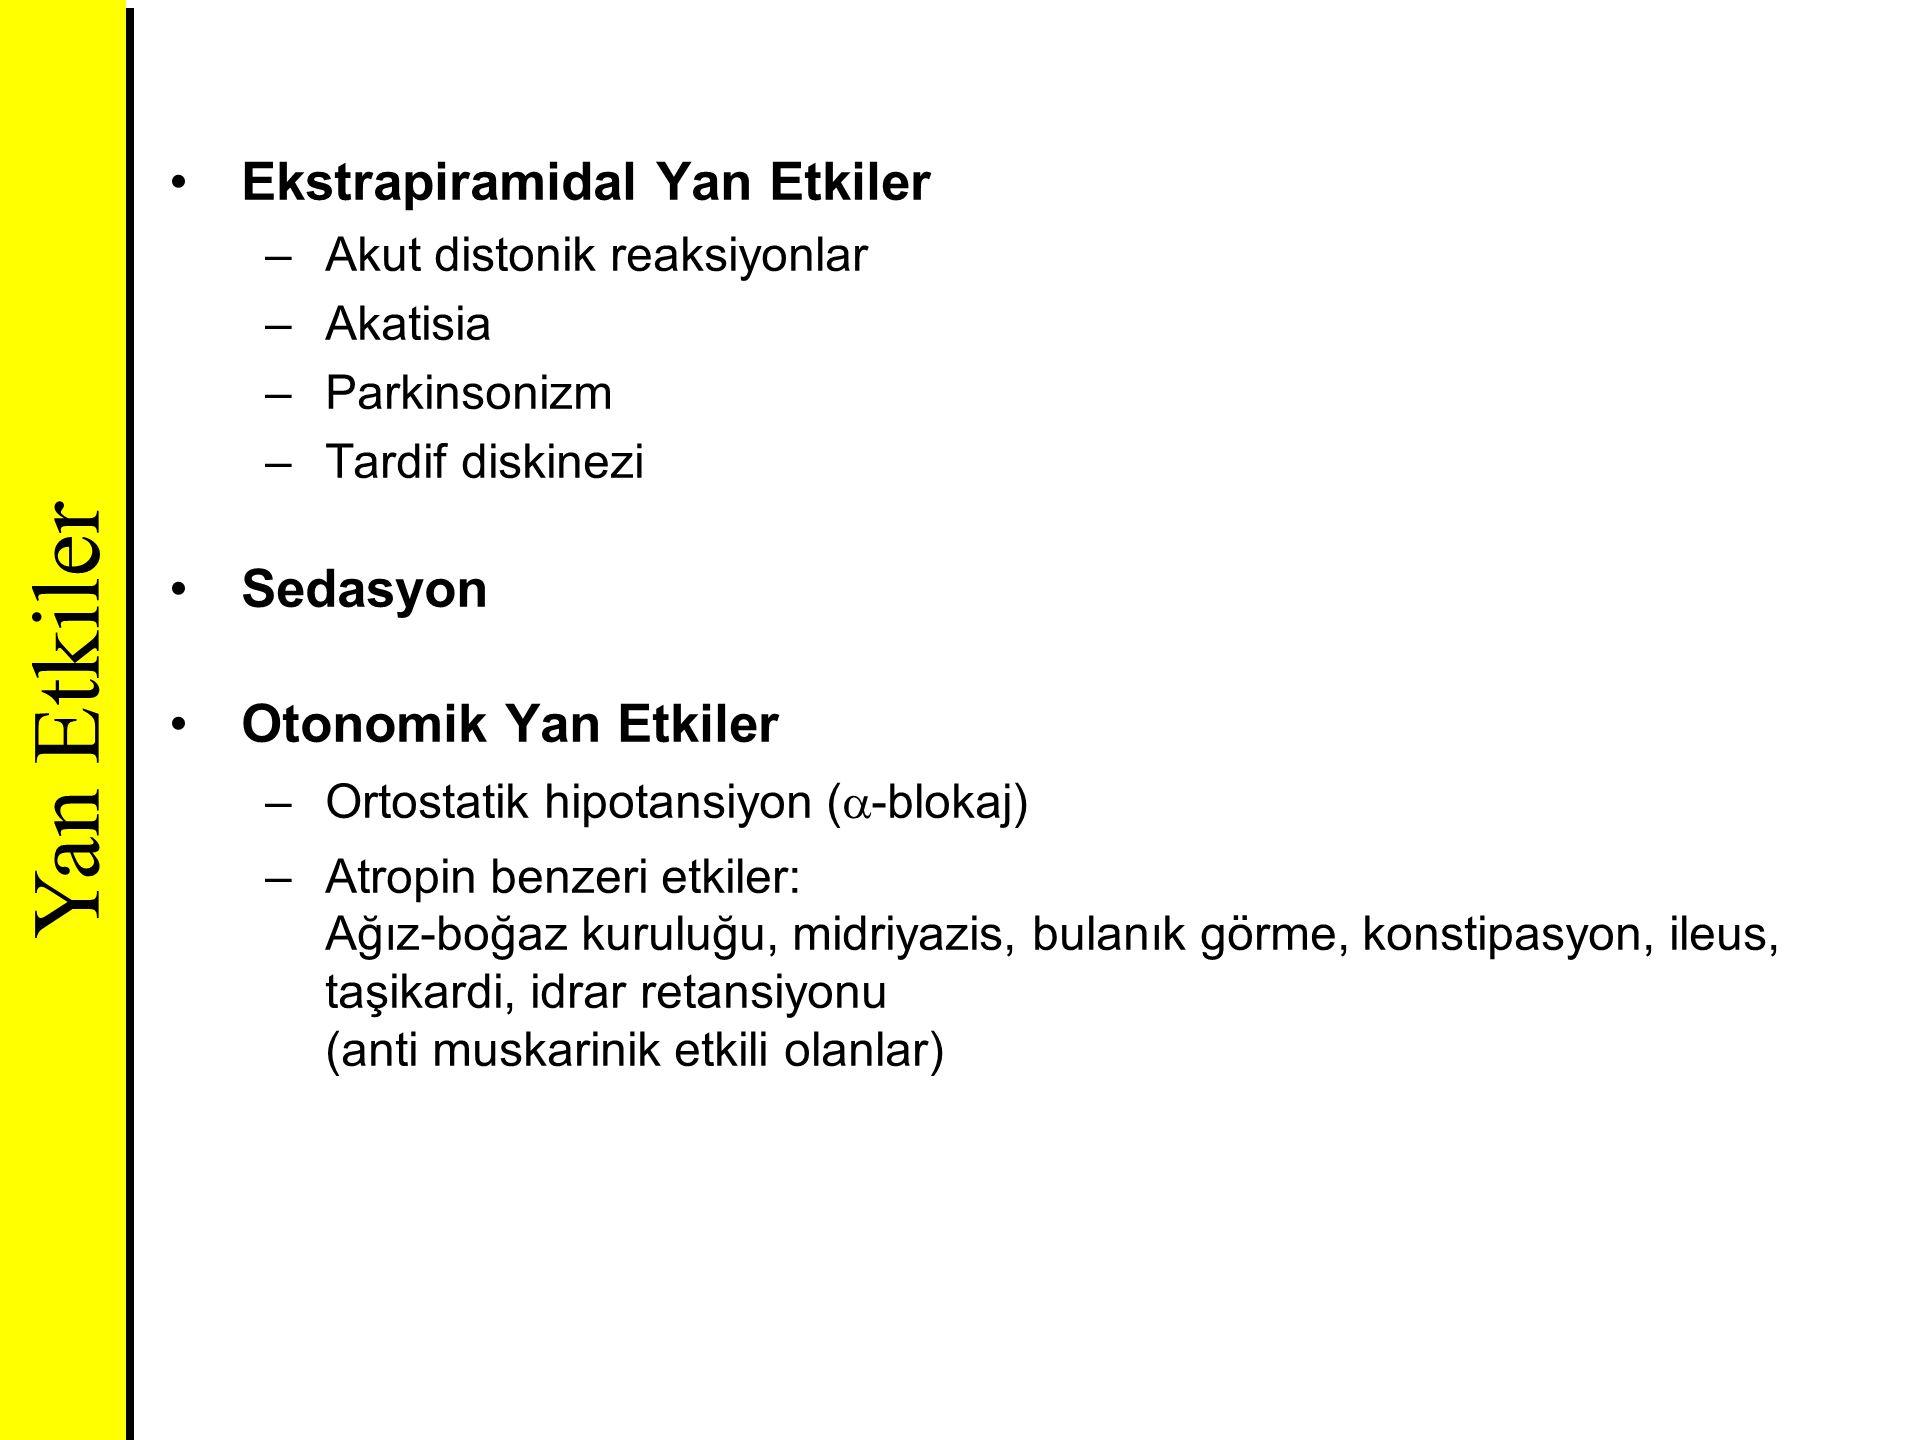 Ekstrapiramidal Yan Etkiler –Akut distonik reaksiyonlar –Akatisia –Parkinsonizm –Tardif diskinezi Sedasyon Otonomik Yan Etkiler –Ortostatik hipotansiy